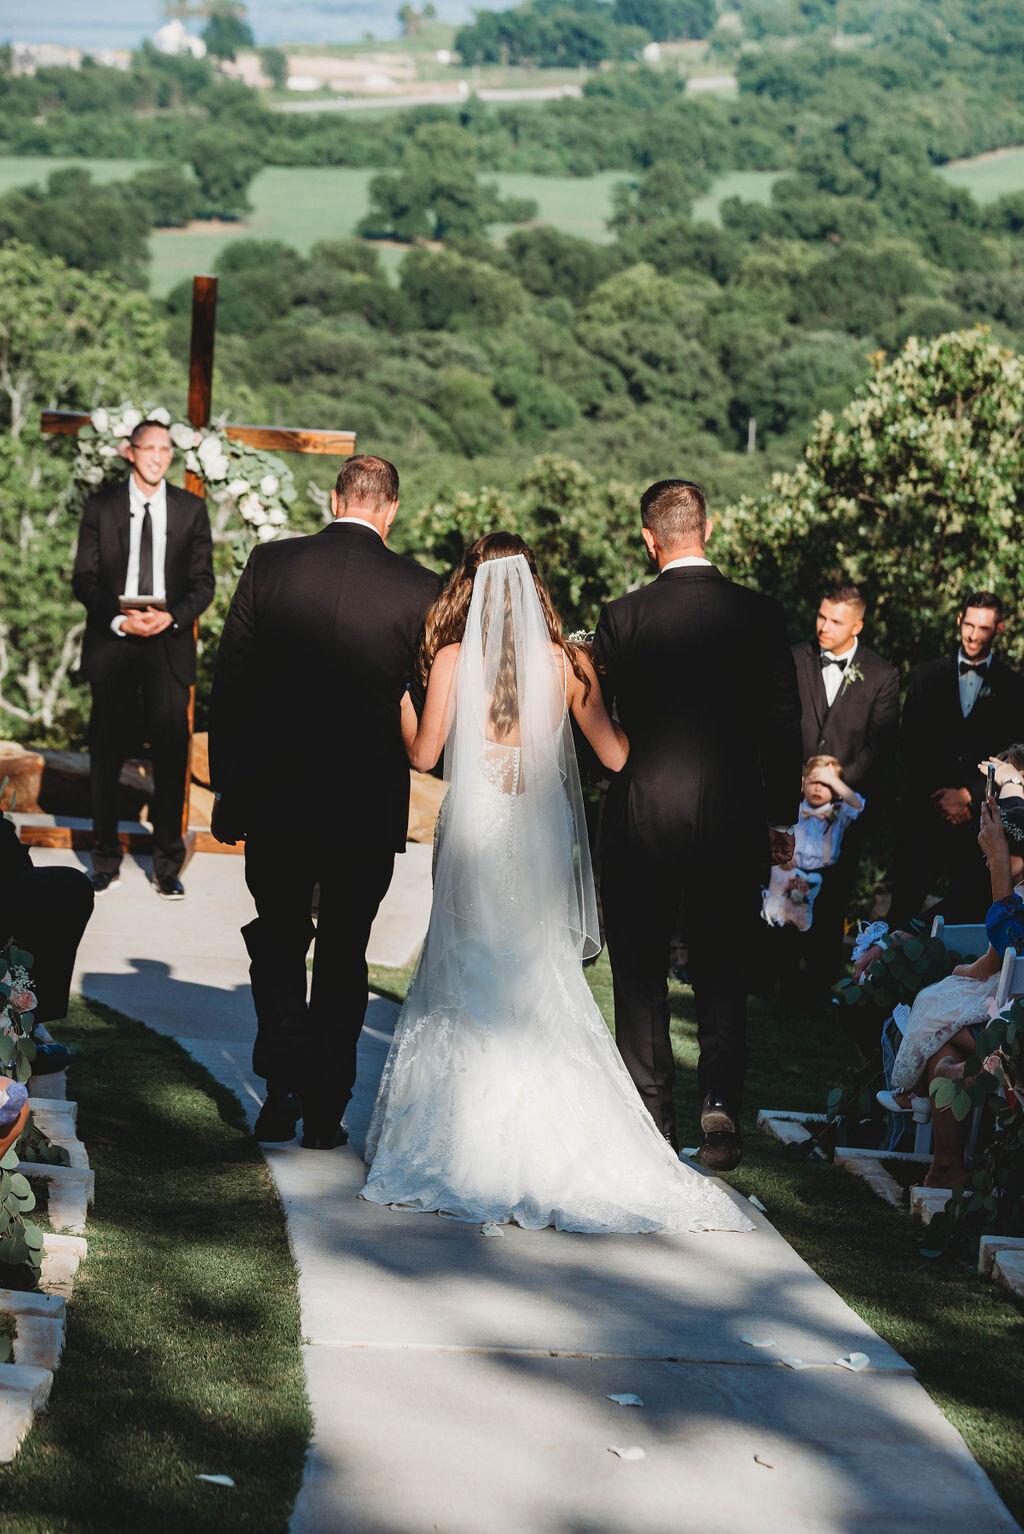 Tulsa Wedding Venue with a View 28.jpg